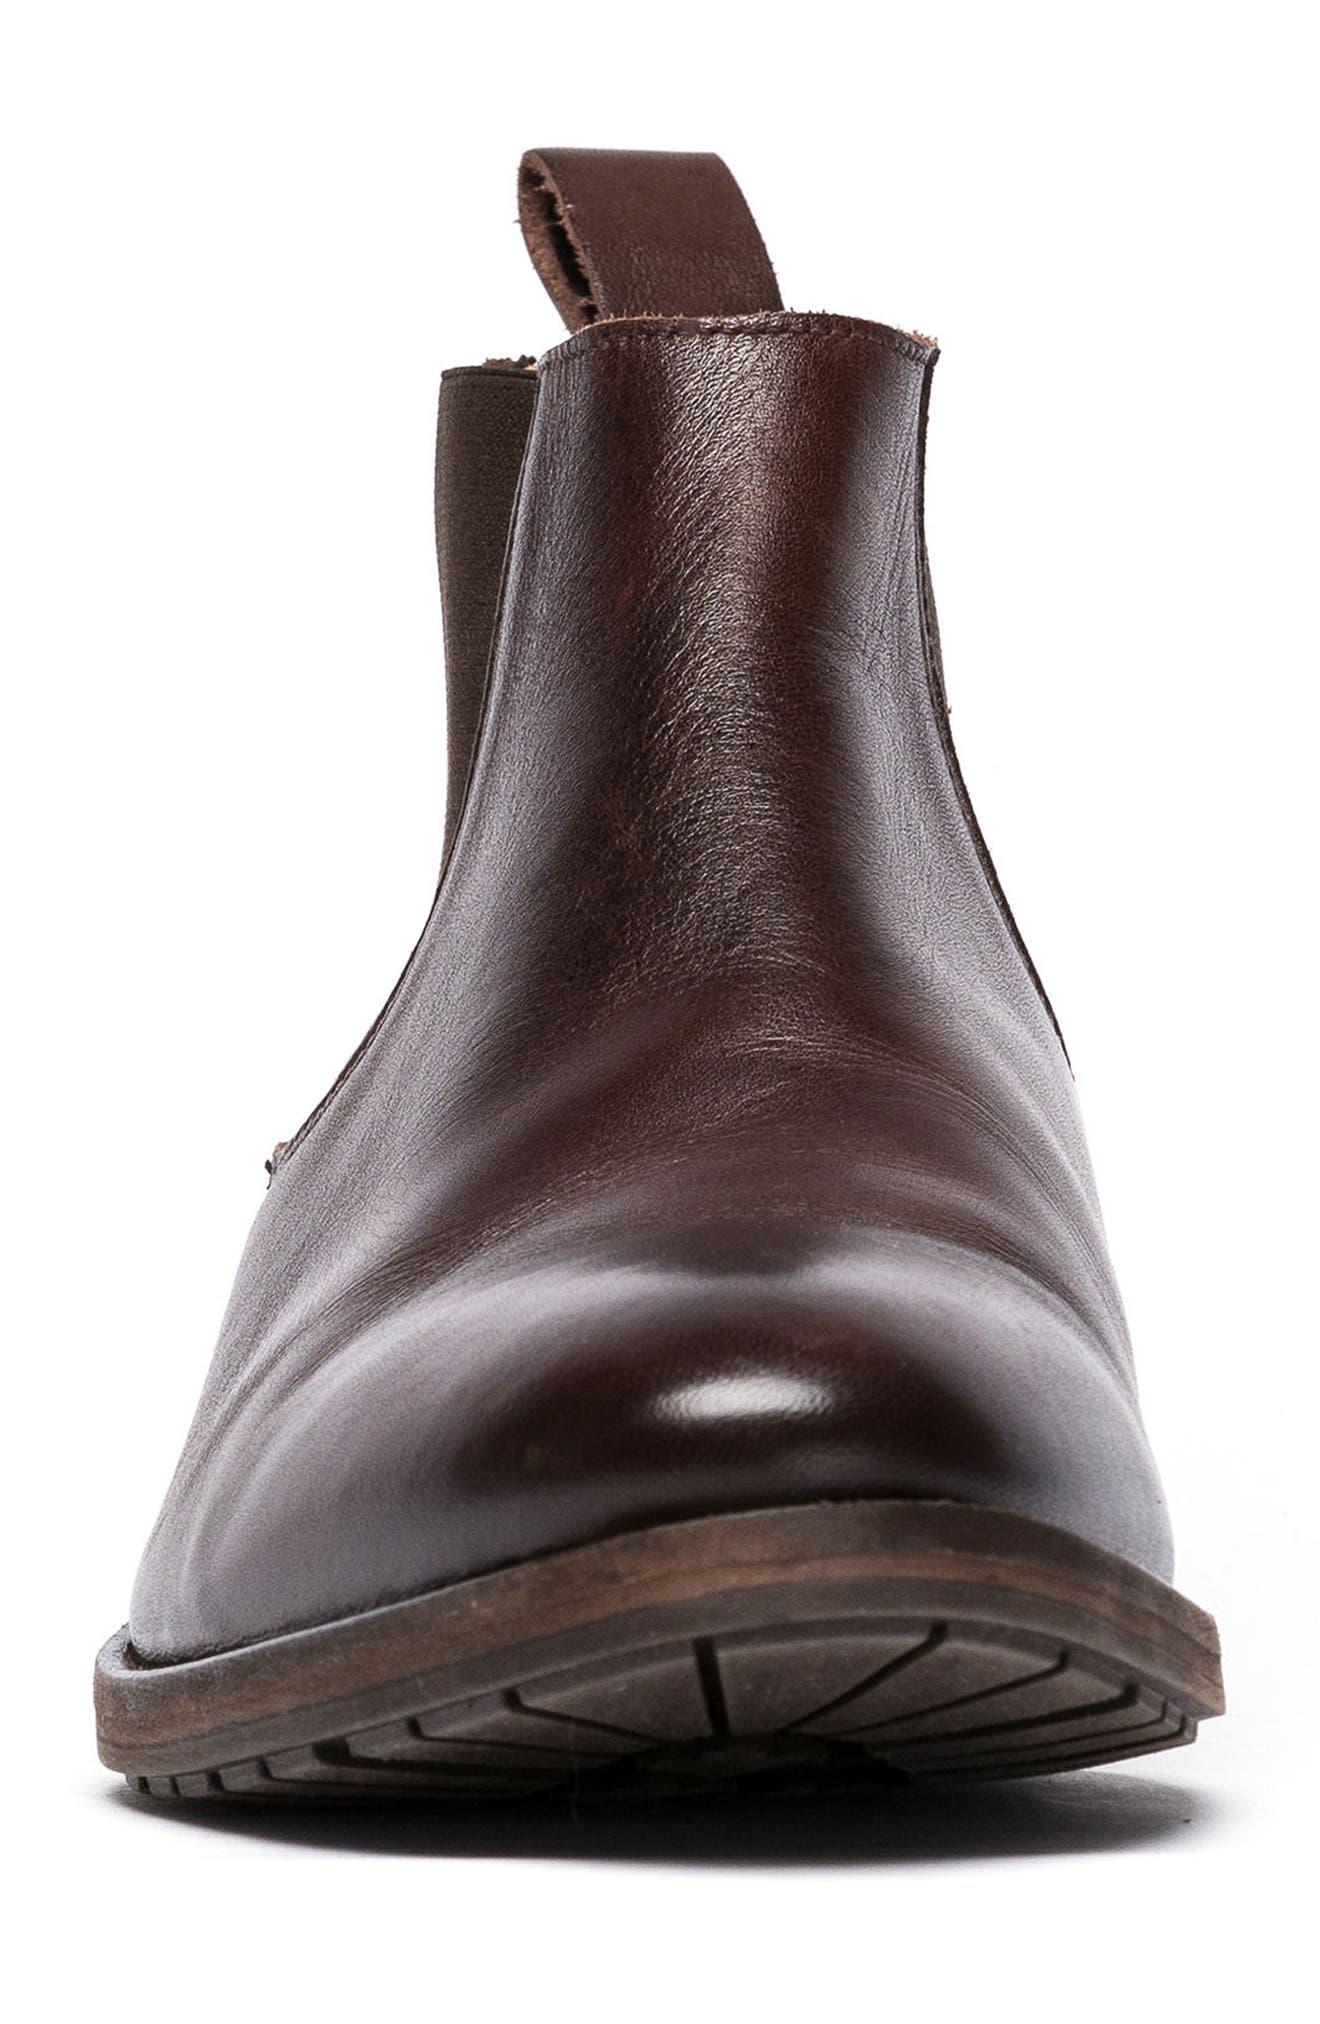 Logan Terrace Chelsea Boot,                             Alternate thumbnail 4, color,                             CHOCOLATE